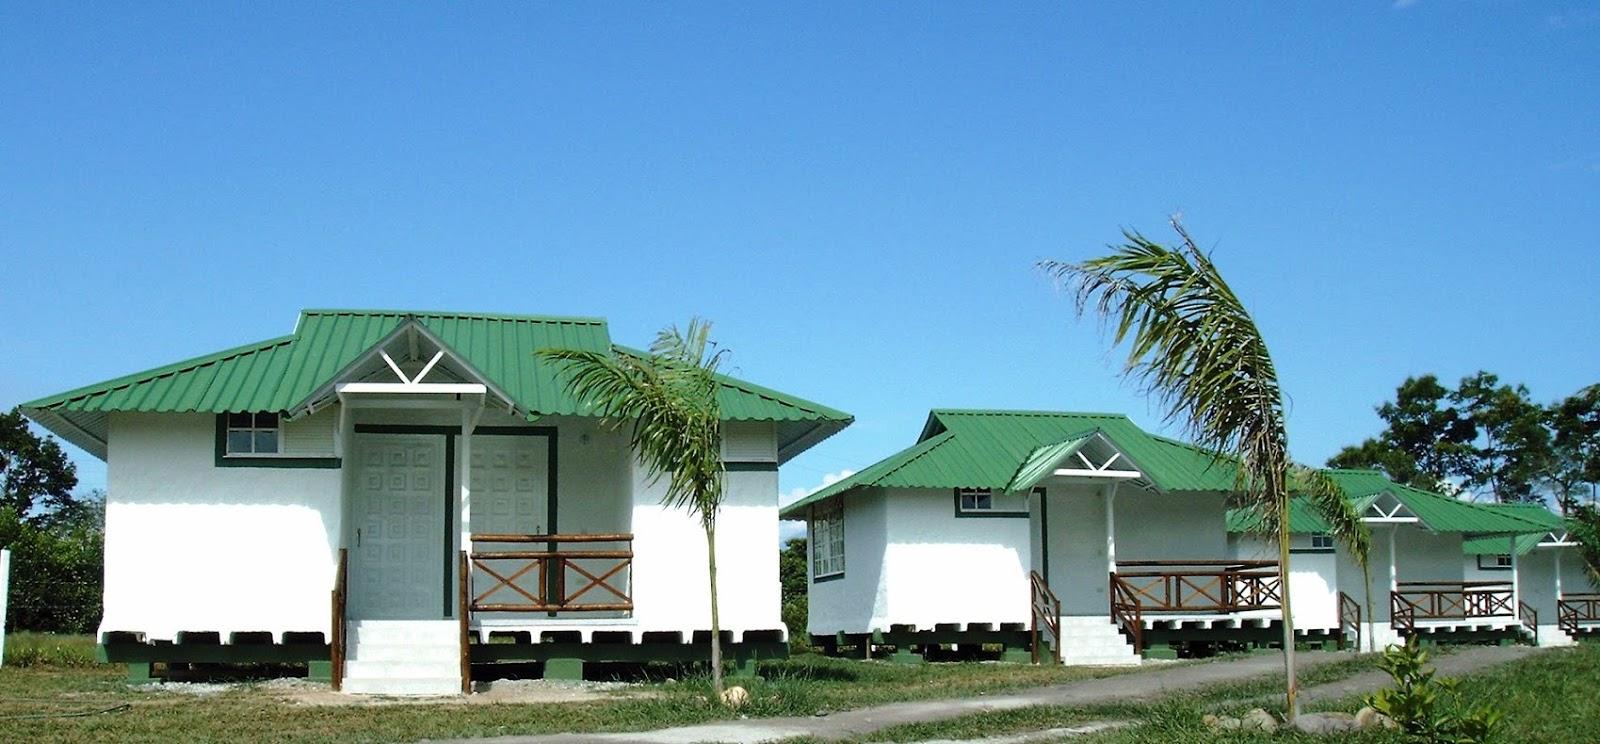 Casas y caba as prefabricadas villavicencio for Disenos de casas prefabricadas modernas